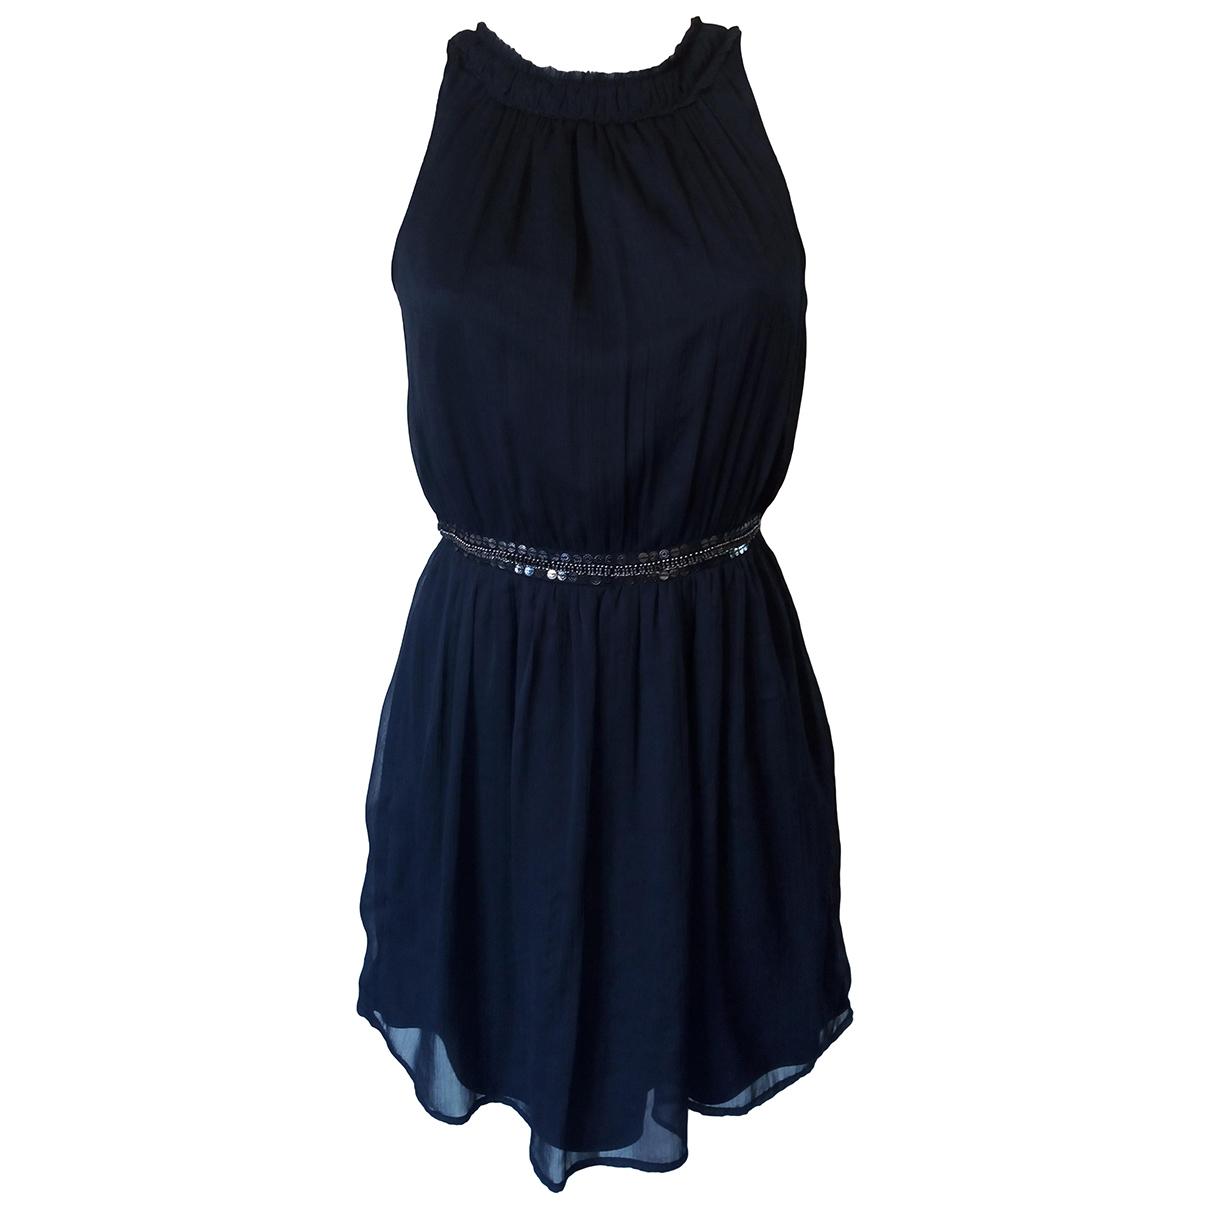 Zara \N Blue dress for Women M International